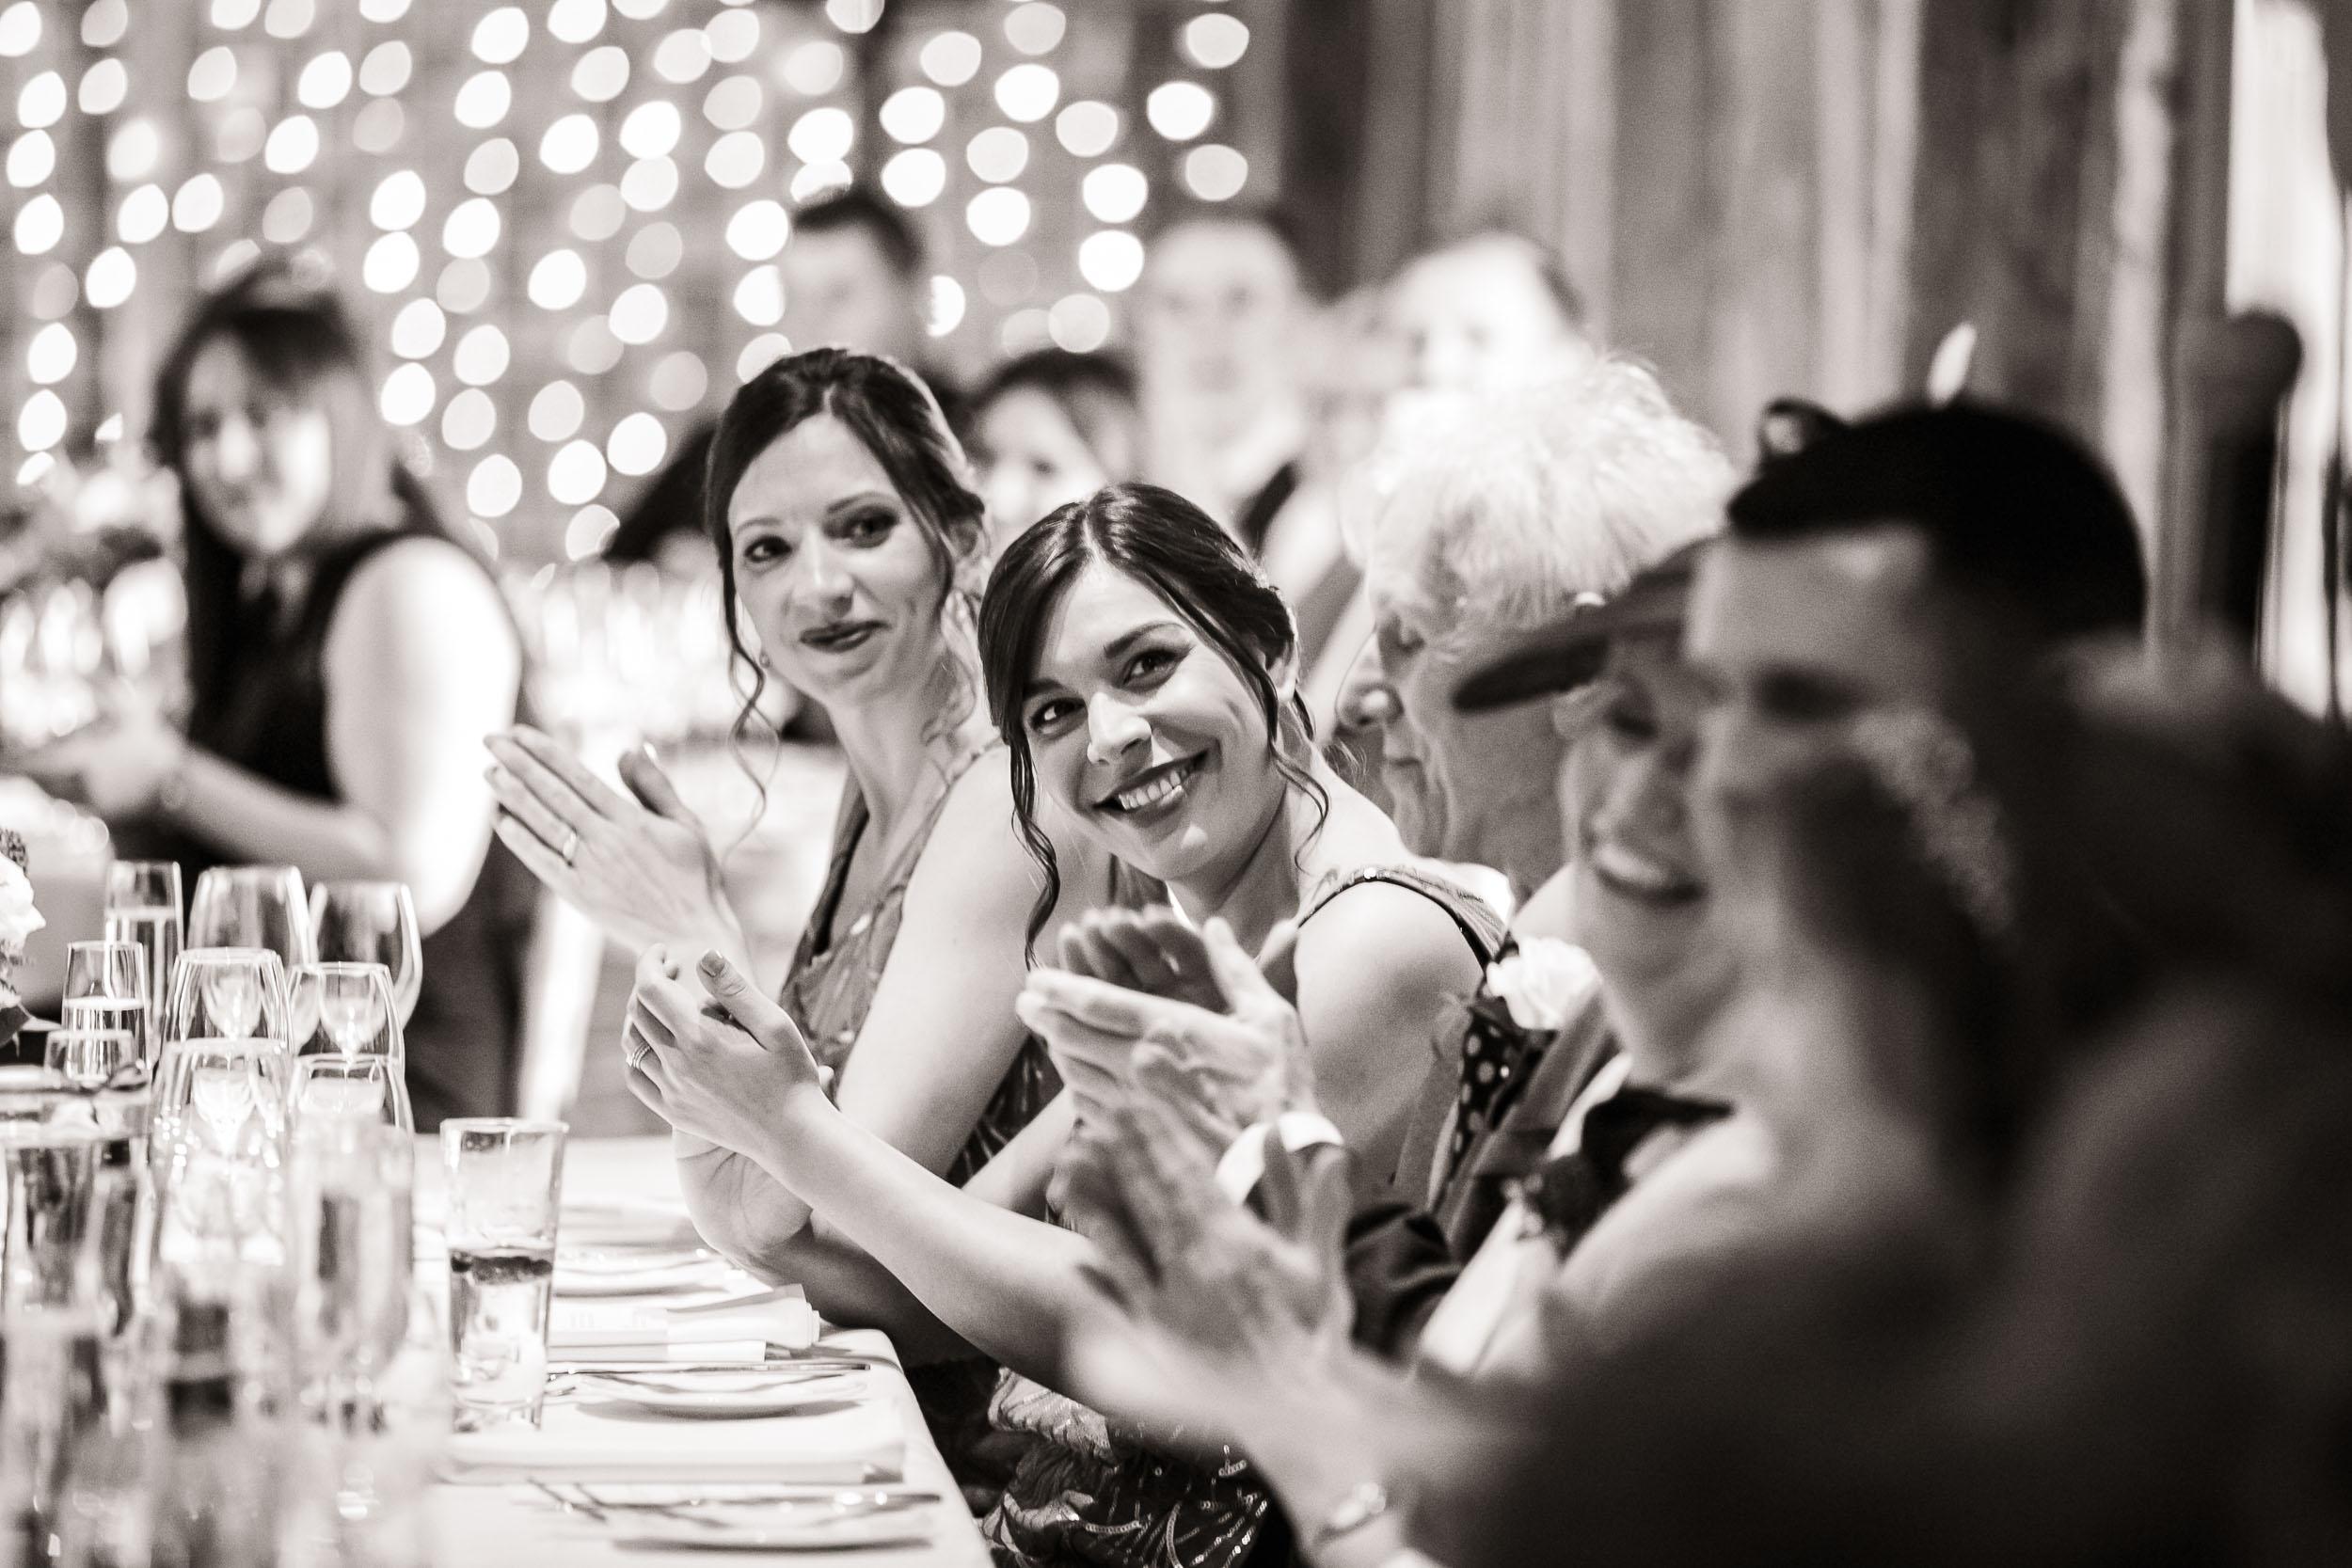 micklefield-hall-wedding-photographer 072.jpg